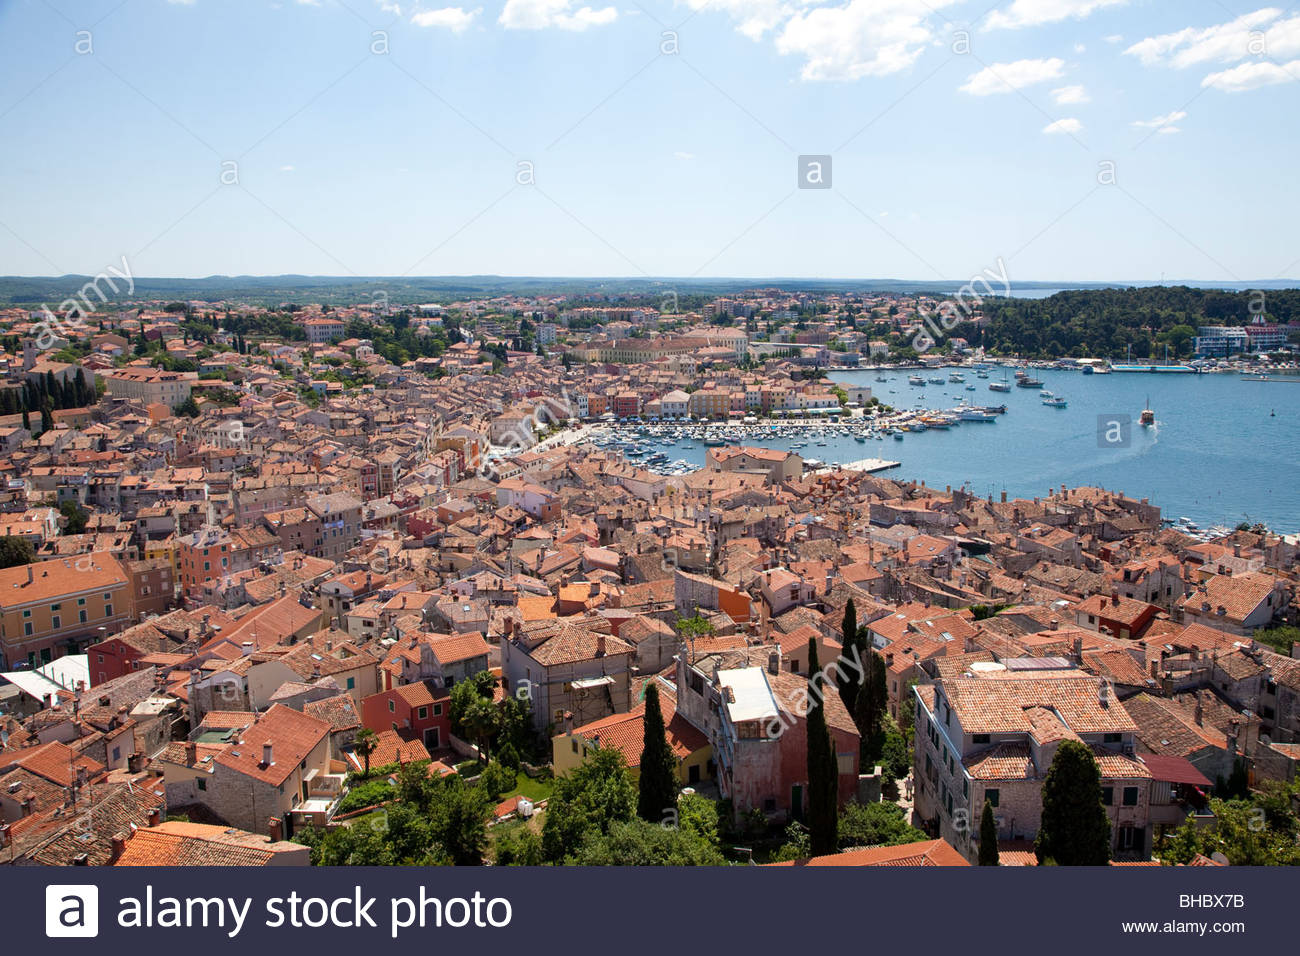 Croatia croatian Europe European Istria Mediterranean old overview roof roofs rooftop rooftops Rovinj town Stock Photo